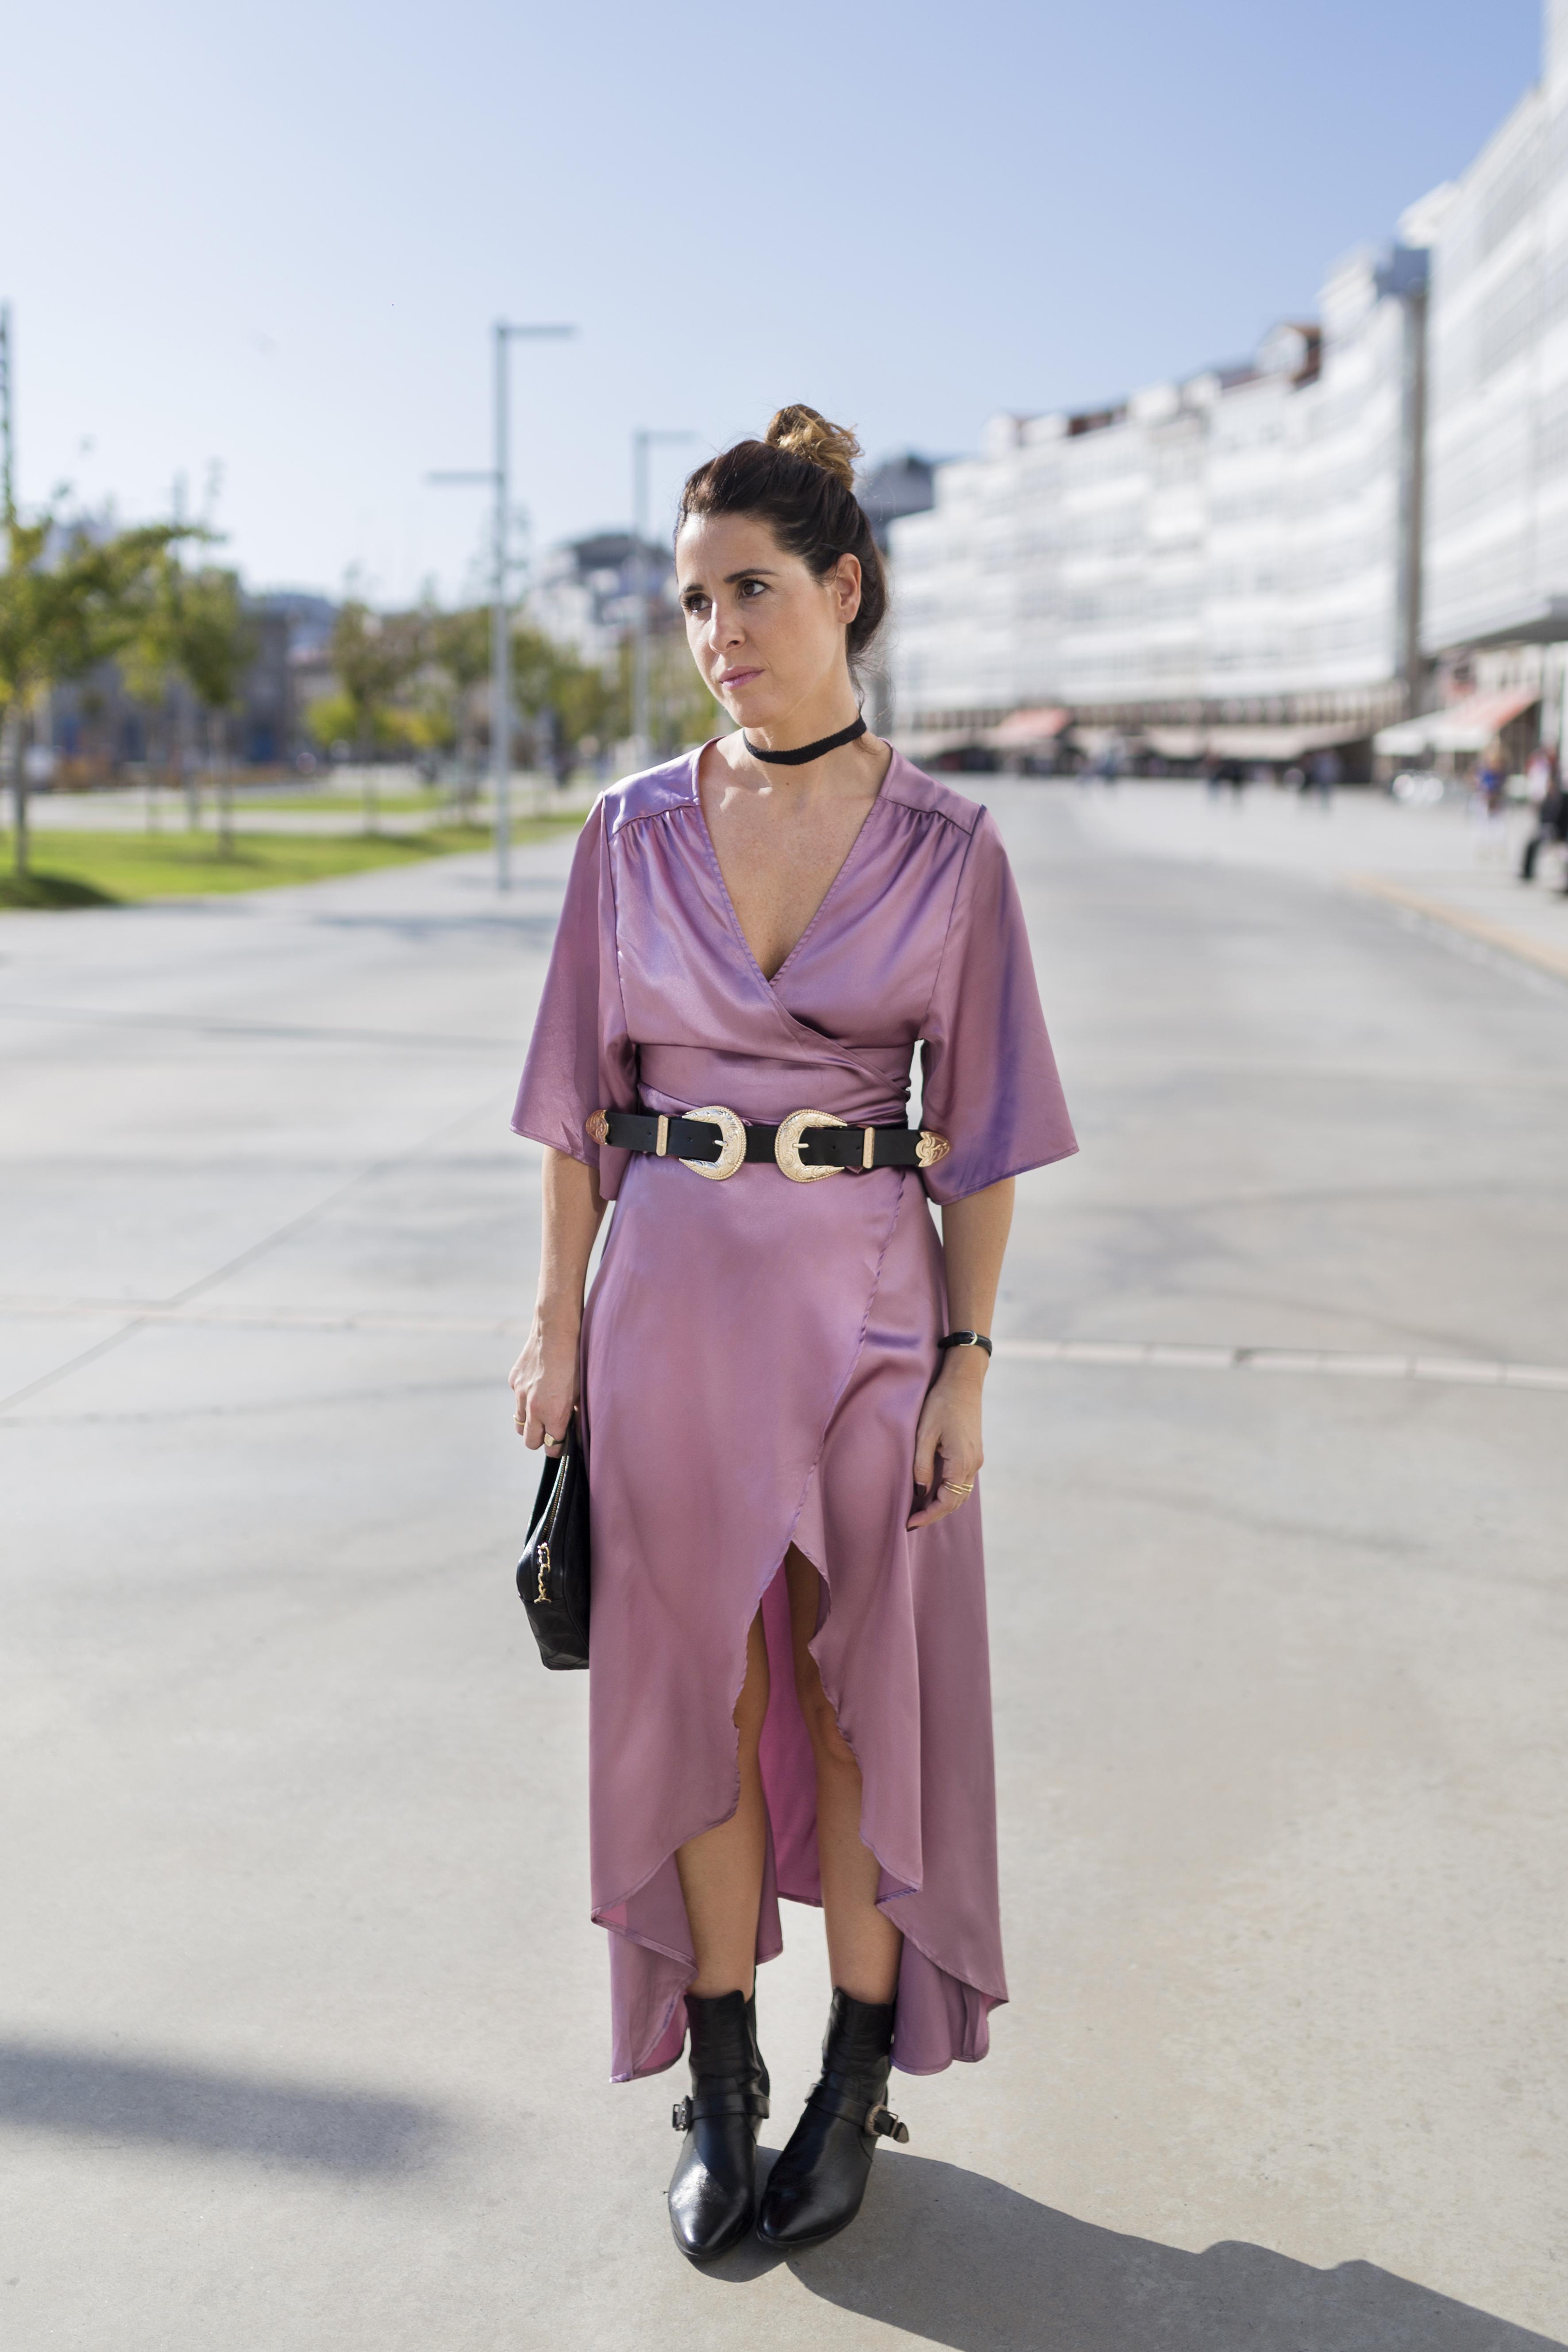 blogger- alba cuesta- vestido satinado - descalzaporelparque-choker zara - SHEIN - ootd - galicia - fashion -blogger - style - moda calle - streetstyle - denia priegue - video - Shein dress - chanel - vintage - botines - zara